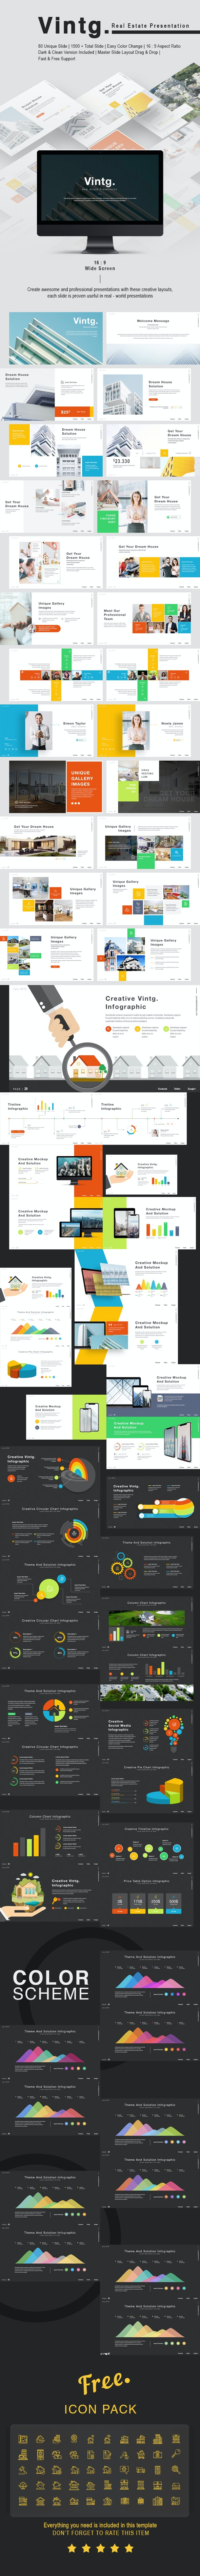 Vintg Real Estate Keynote Template - Keynote Templates Presentation Templates